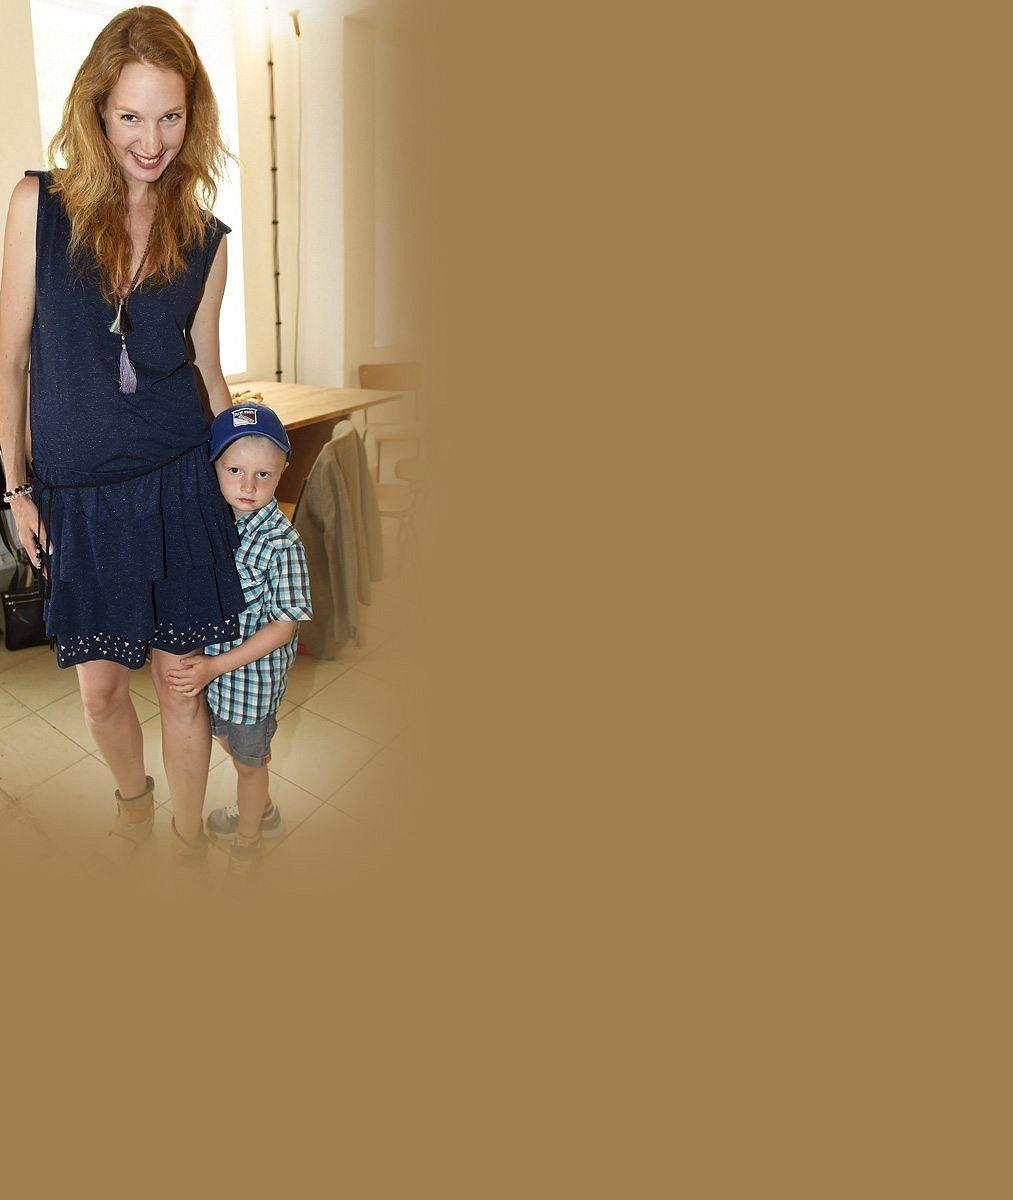 Po rozvodu je zase šťastná a čeká 2. miminko: Dcera Nálepkové a Nesvadby si ale známého herce brát nebude